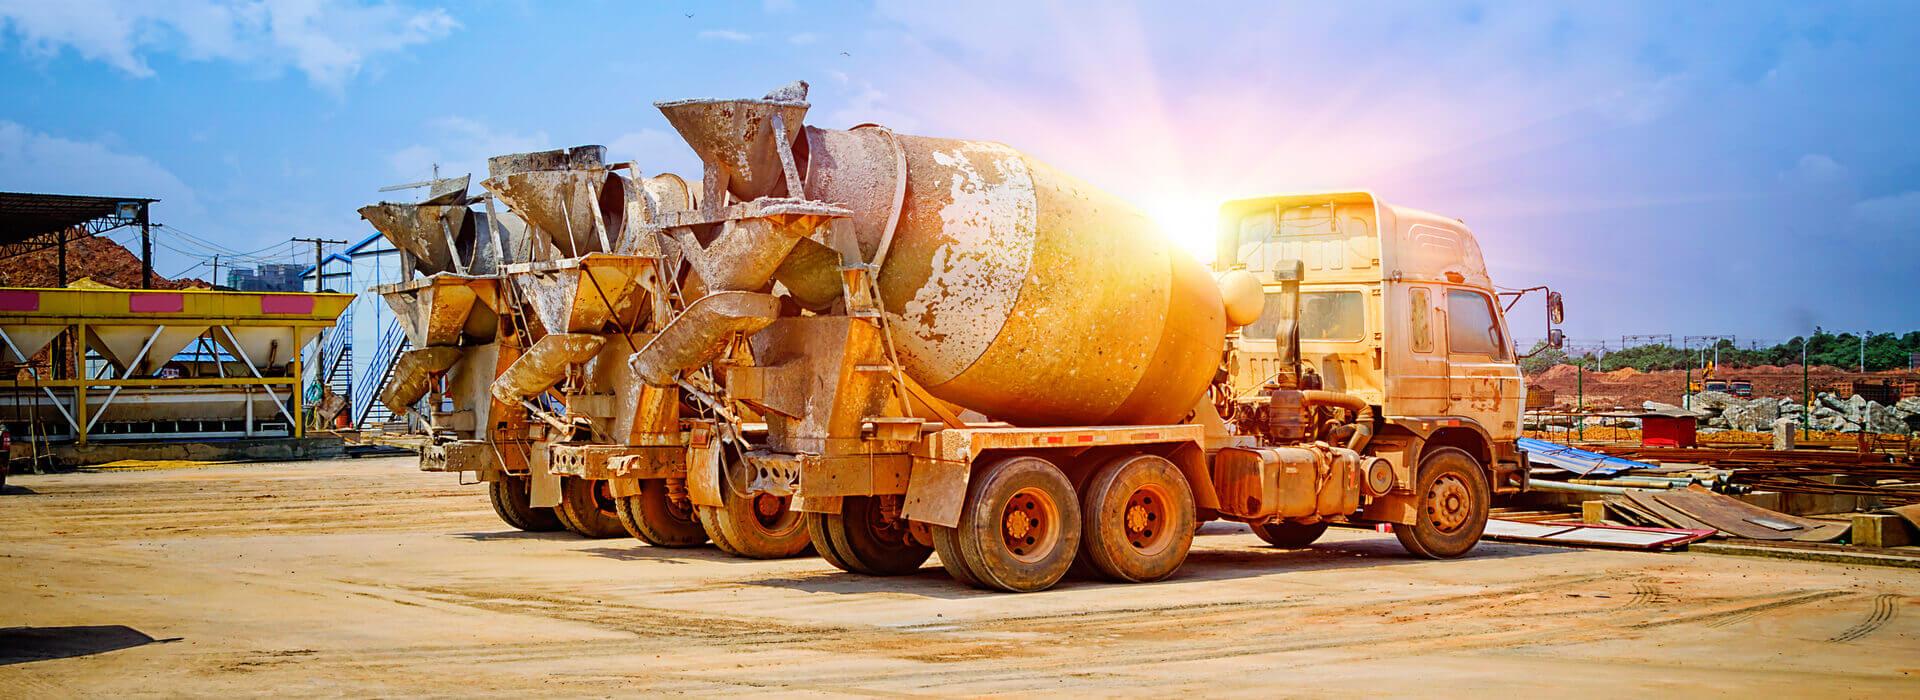 3 cementmolenwagens in de zon